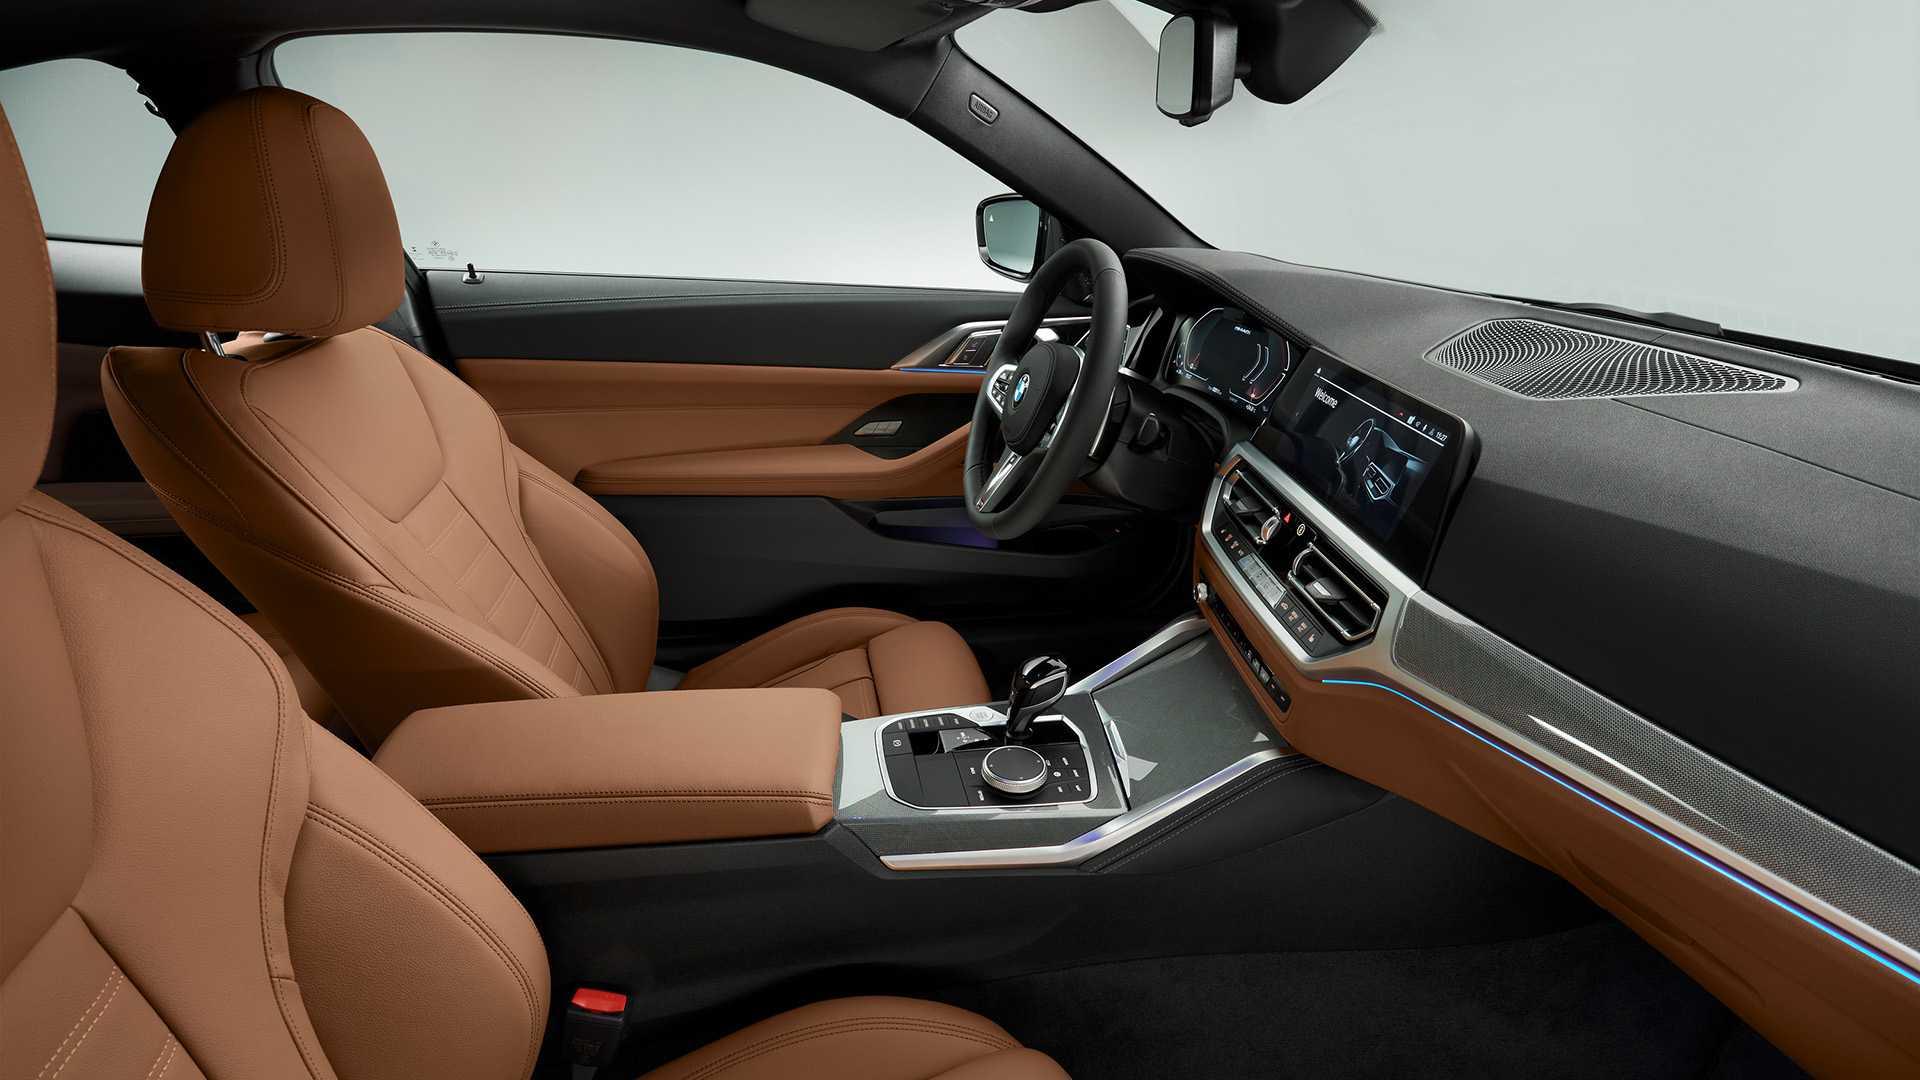 bmw-4er-coupe-202040.jpg